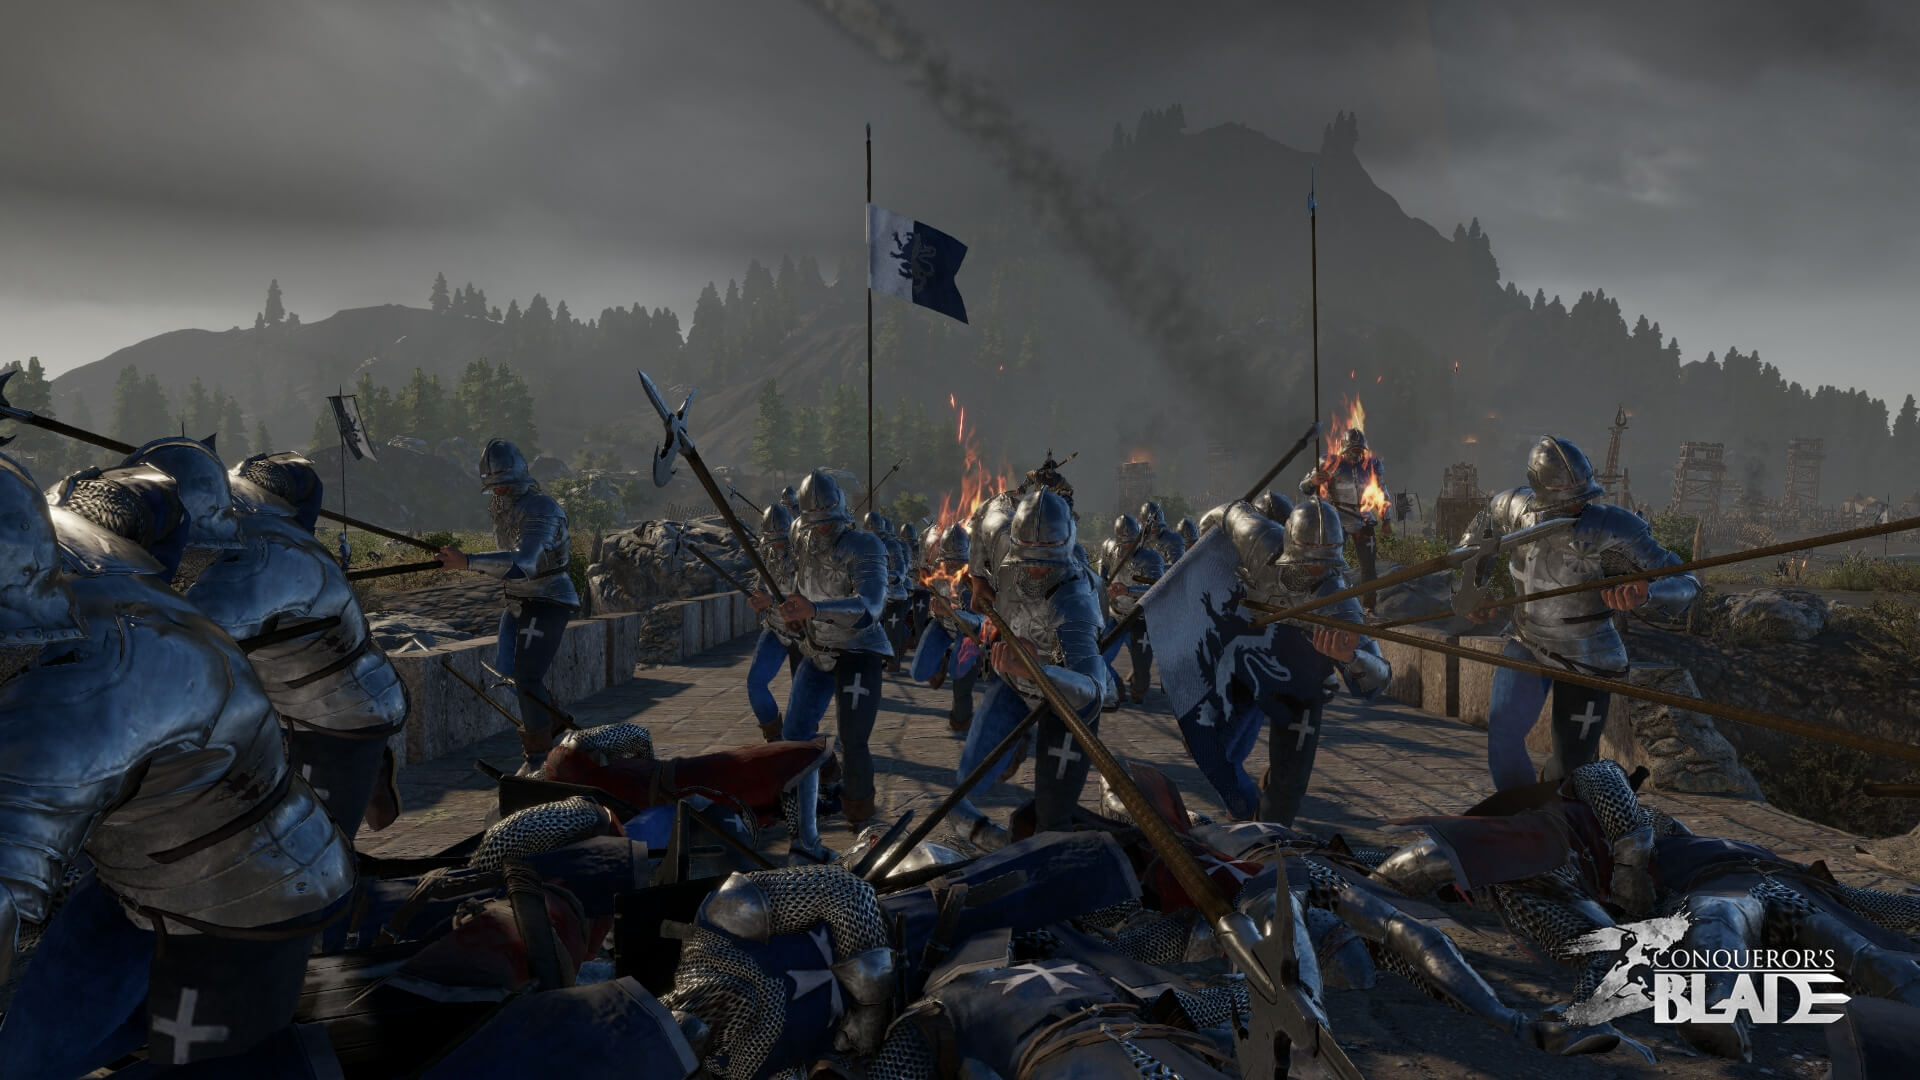 Conquerors-blade-screenshot-01